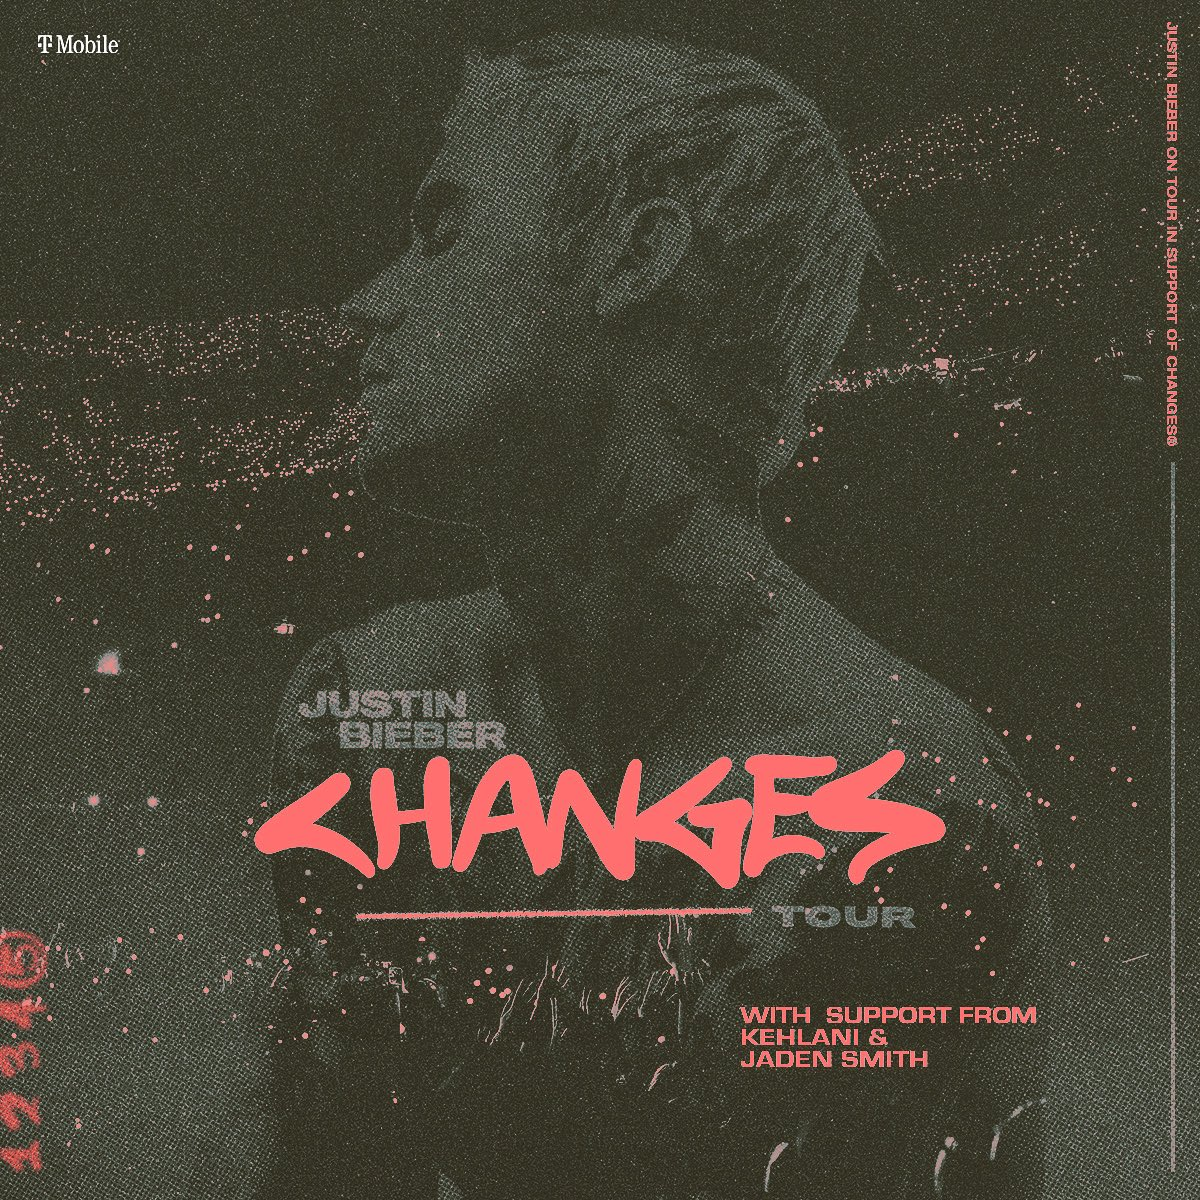 @justinbieber's photo on #ChangesTour